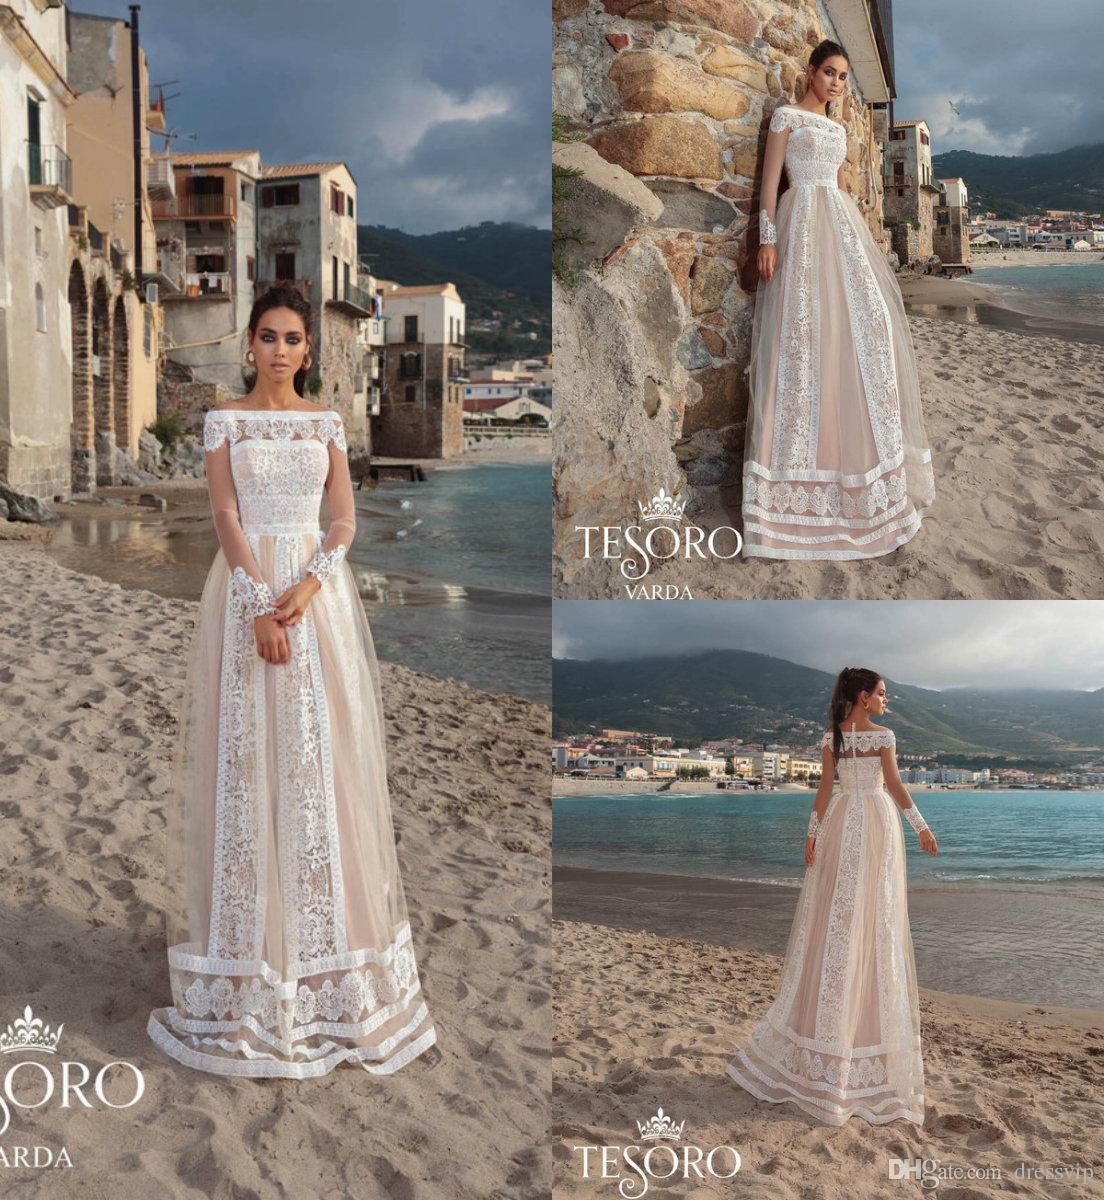 89d2470628e Discount 2019 A Line Beach Wedding Dresses Off The Shoulder Lace Appliqued  Floor Length Long Sleeve Bridal Gowns Boho Champagne Wedding Dress A Line  Wedding ...